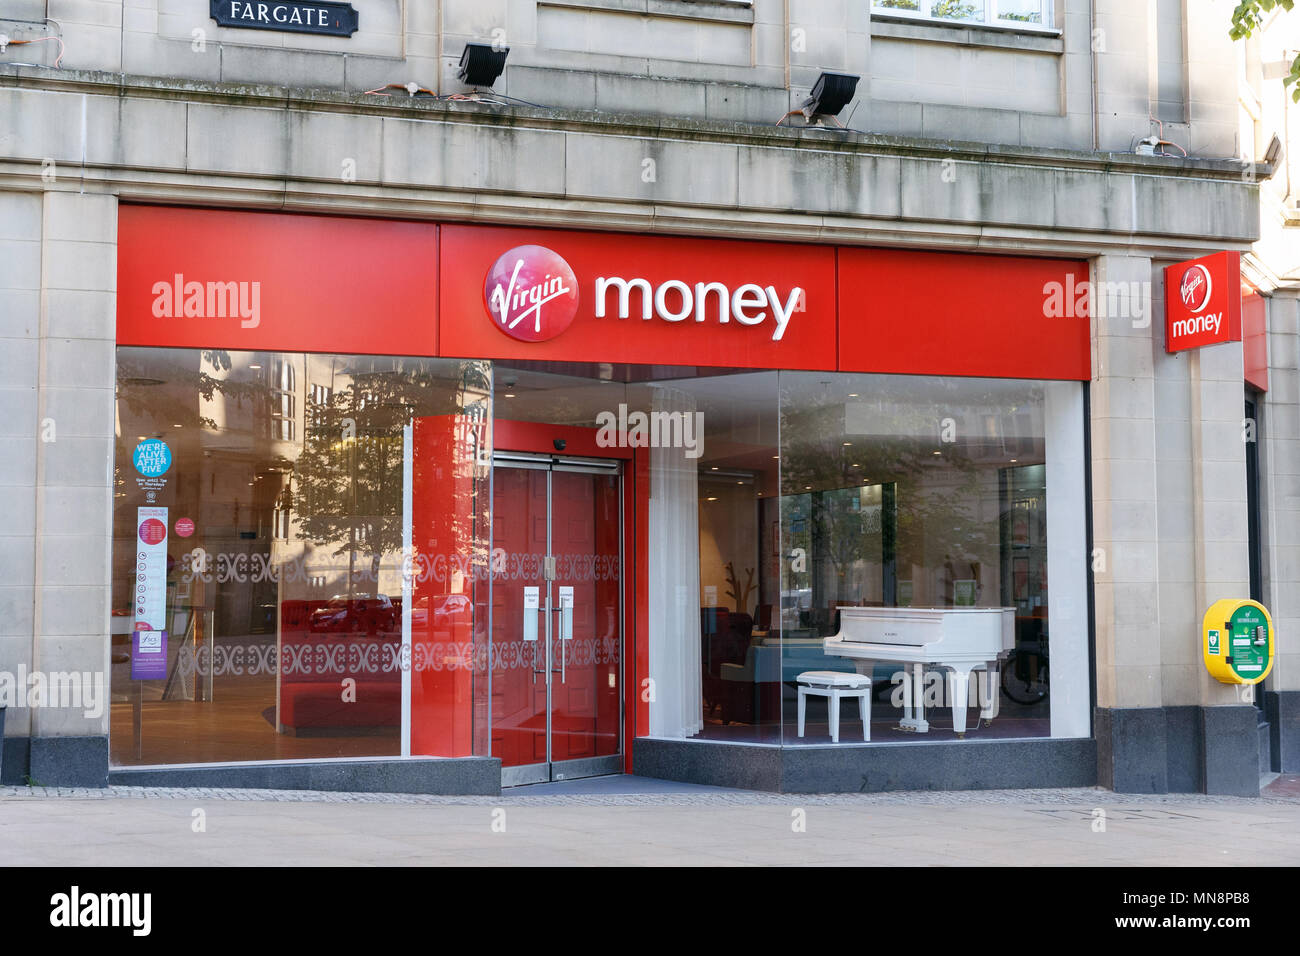 Virgin Money Stock Photos & Virgin Money Stock Images - Alamy